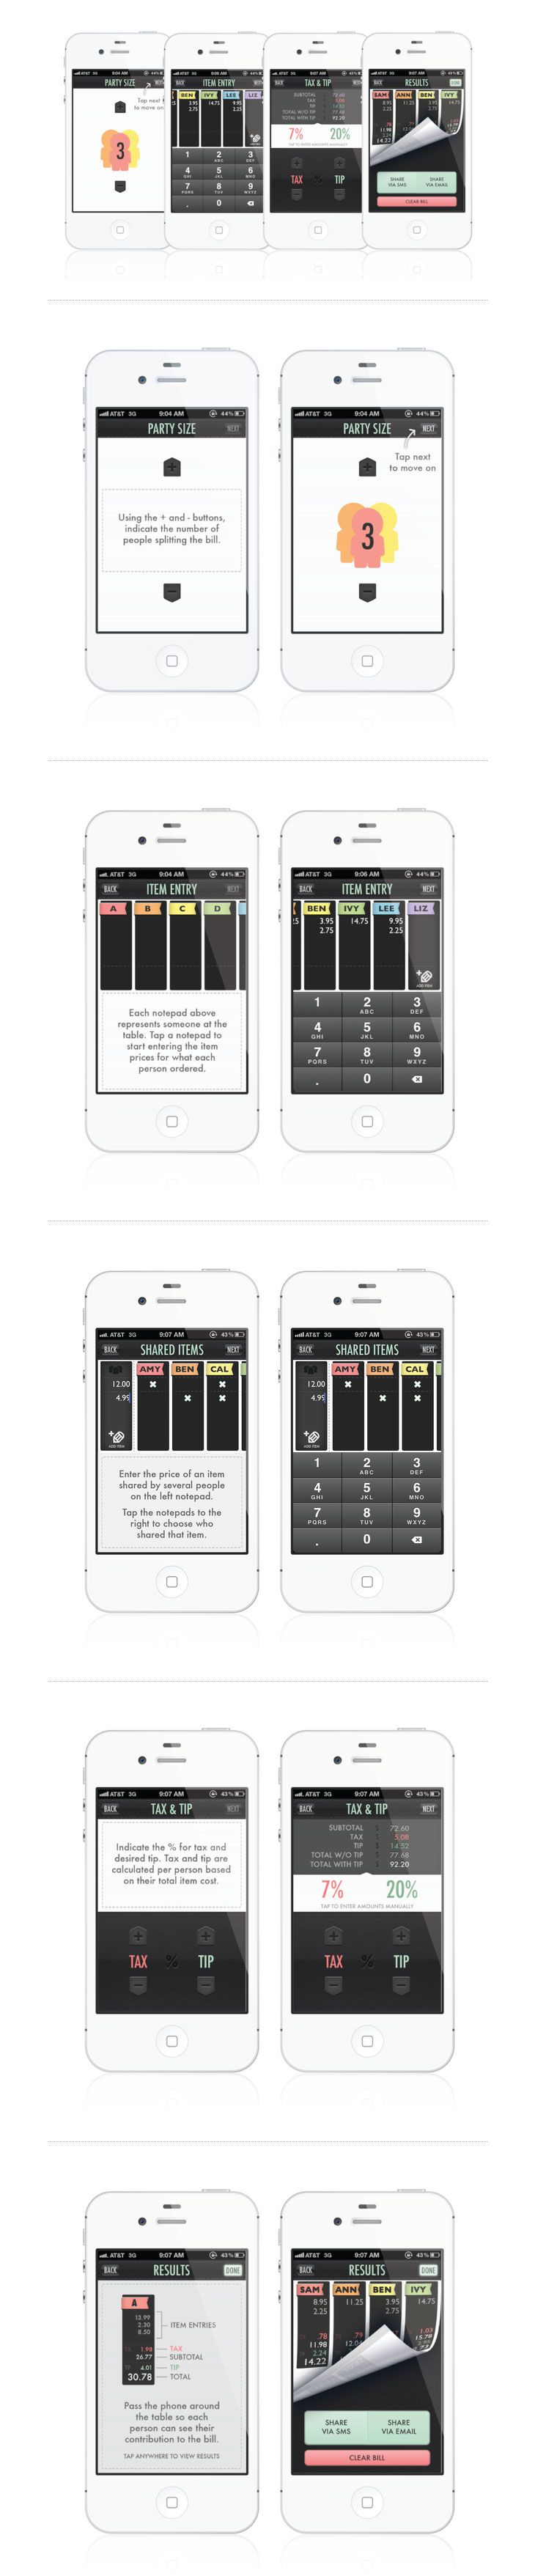 Collection of color palettes photoshop for ui designs web3canvas - Billr Iphone App Ui Design